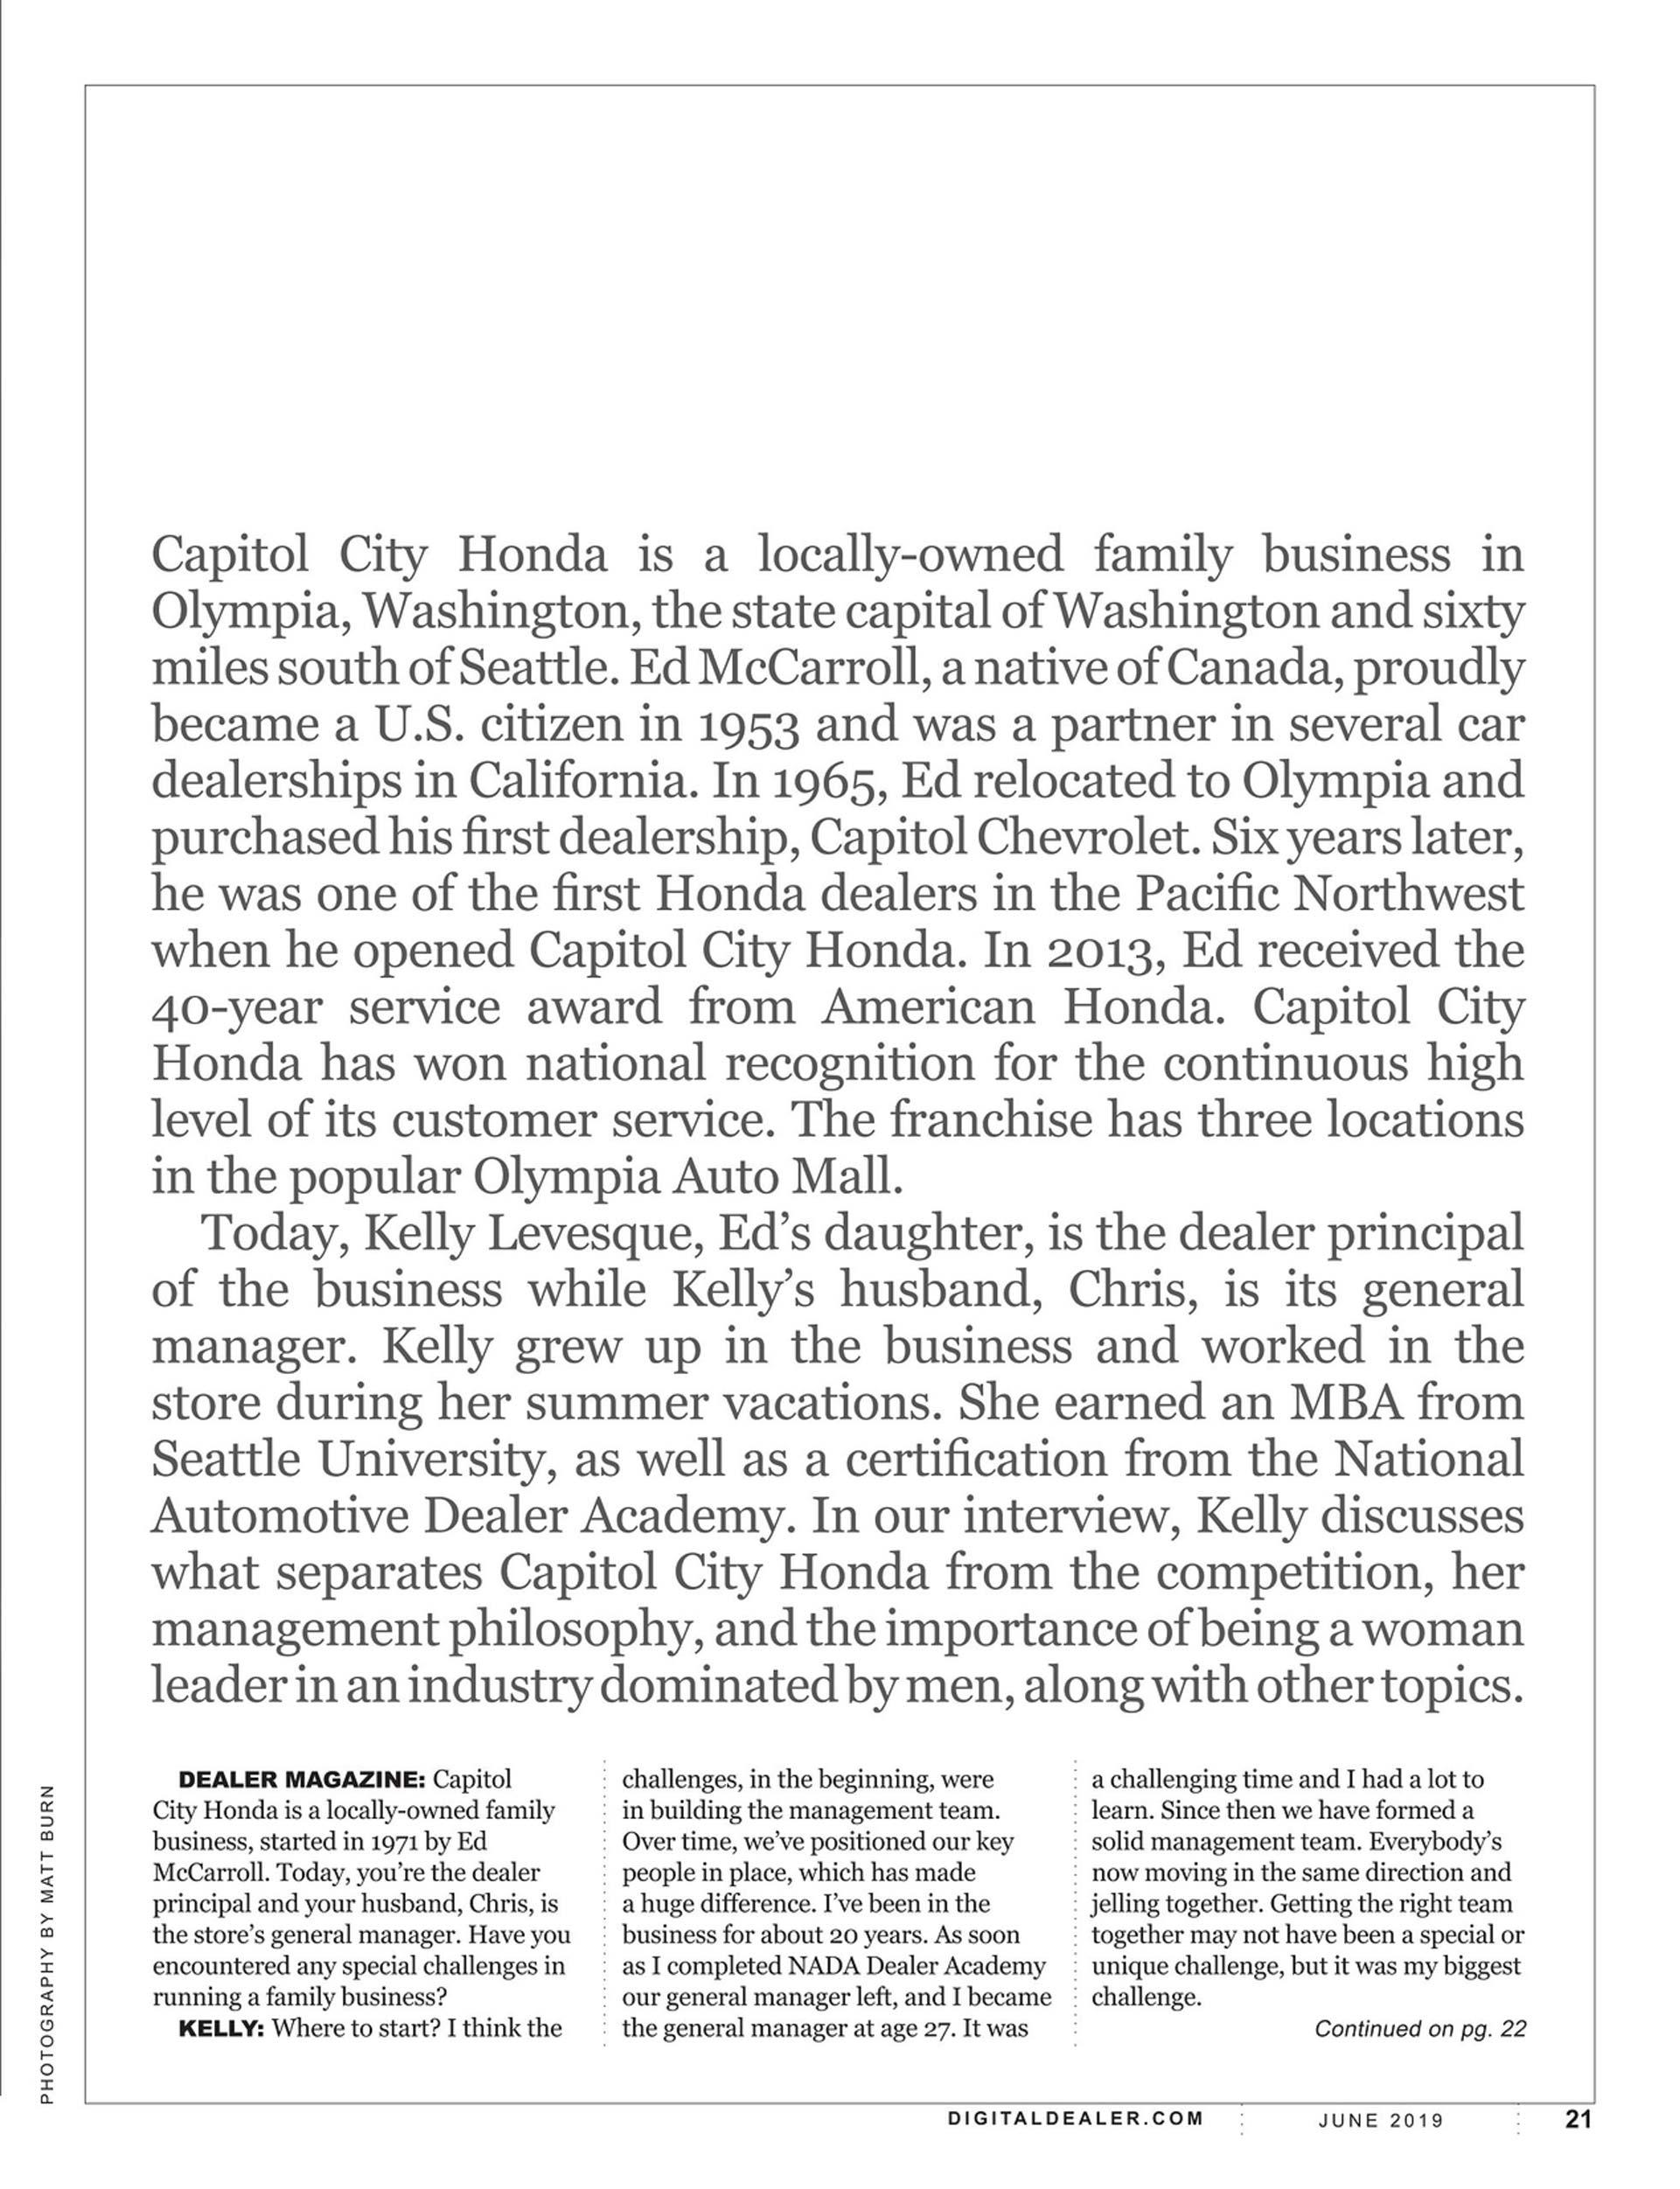 Capitol City Honda in Dealer Magazine 3